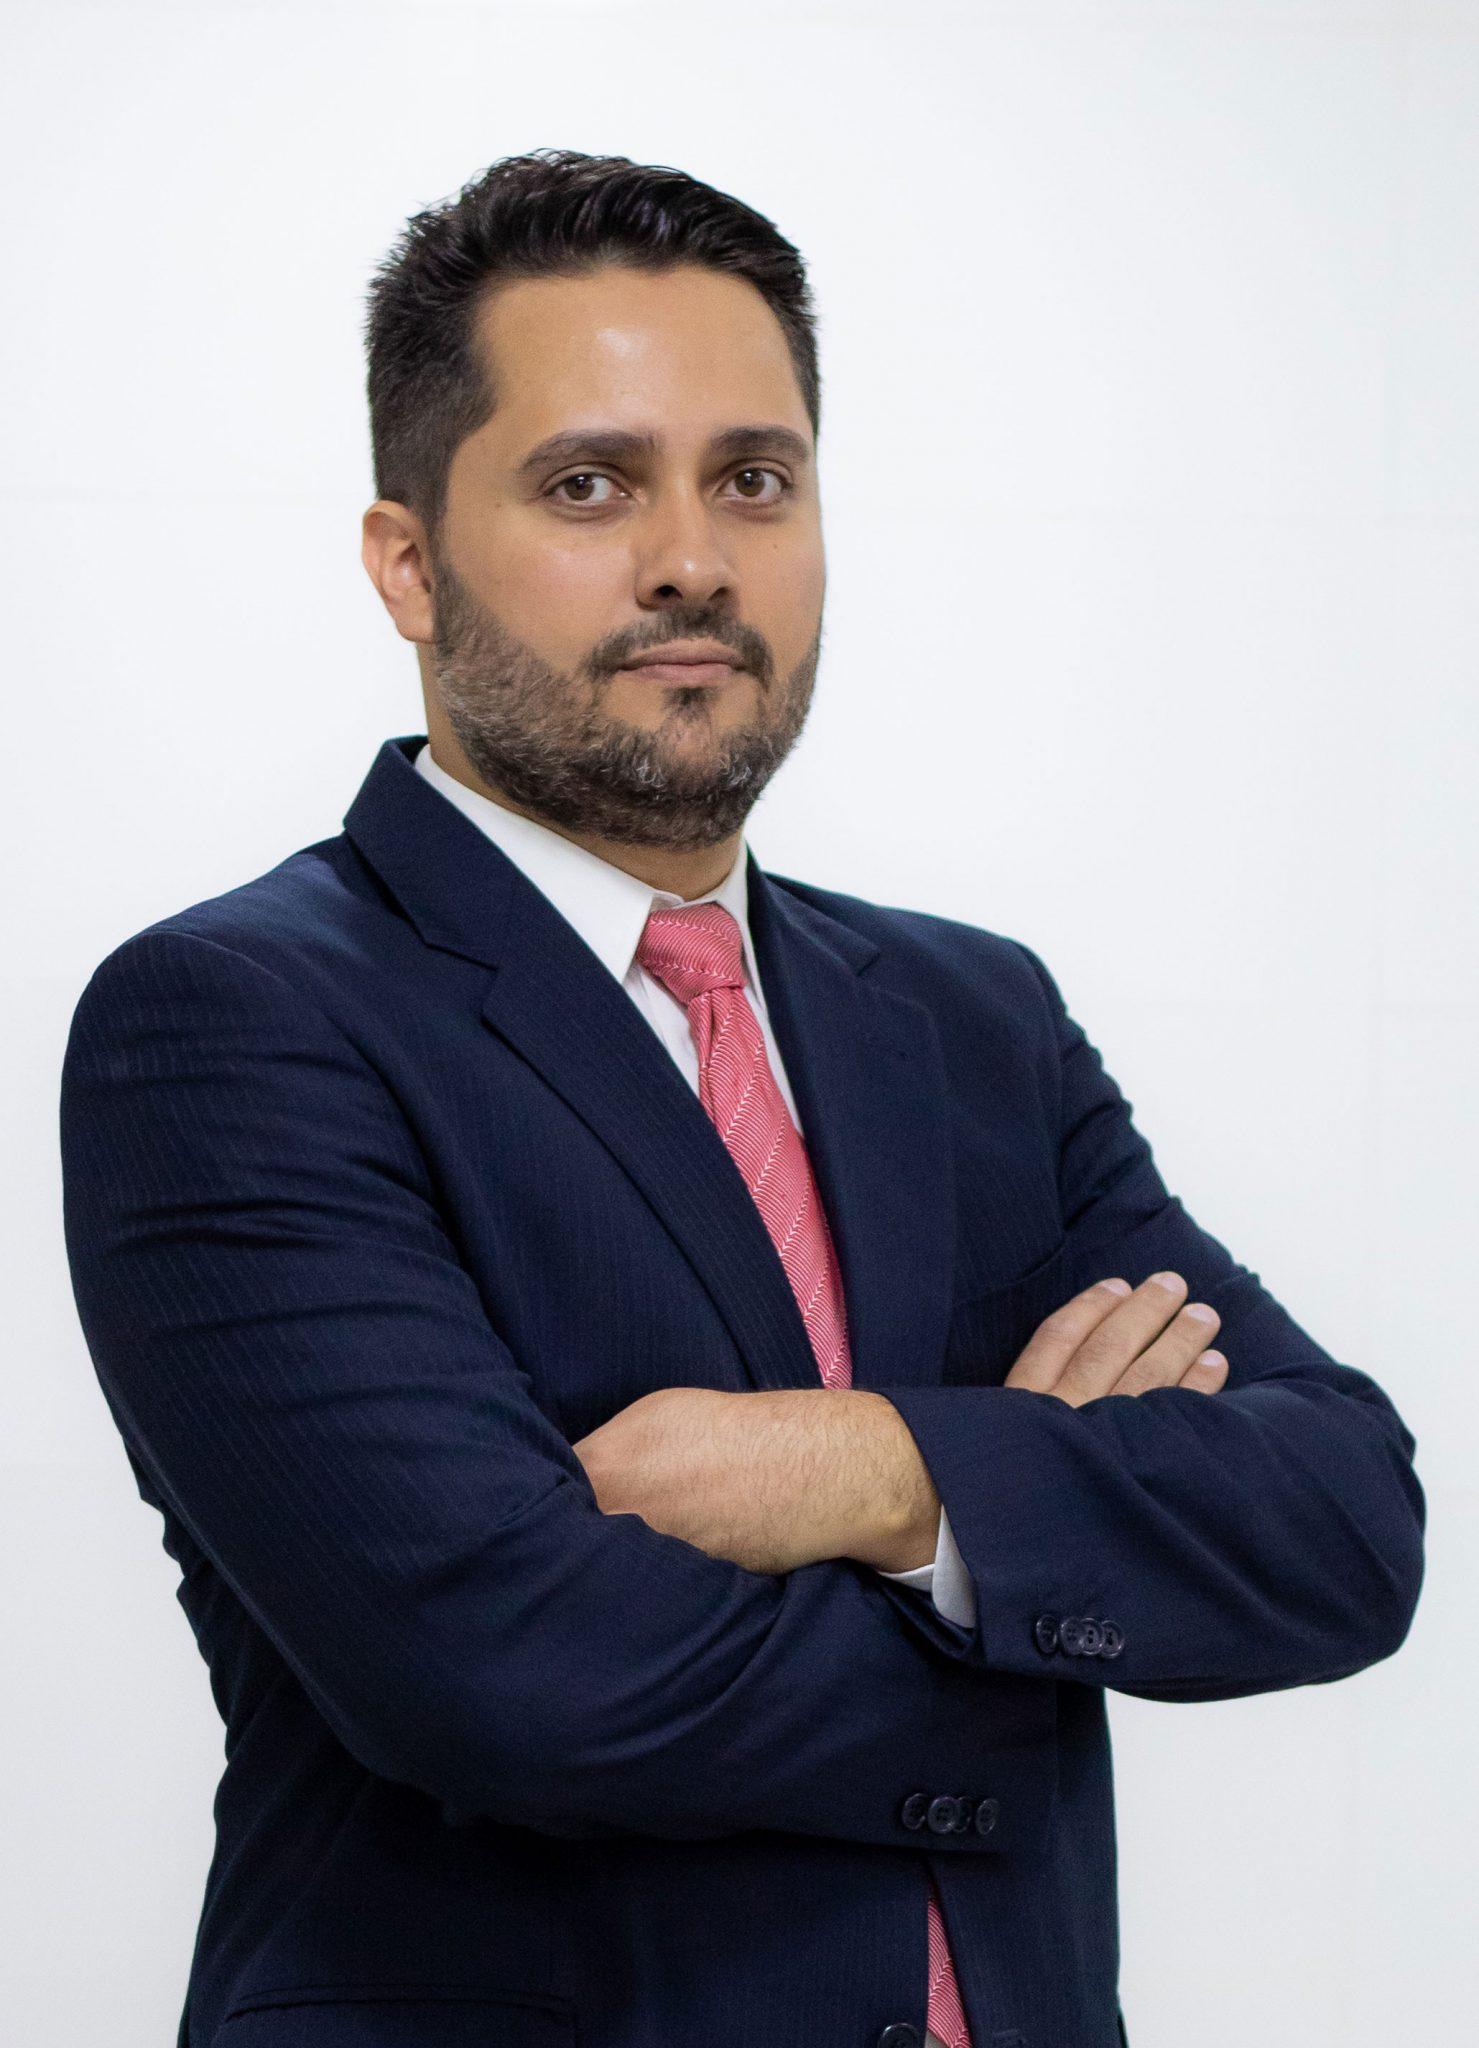 Fabricio Silva Mota